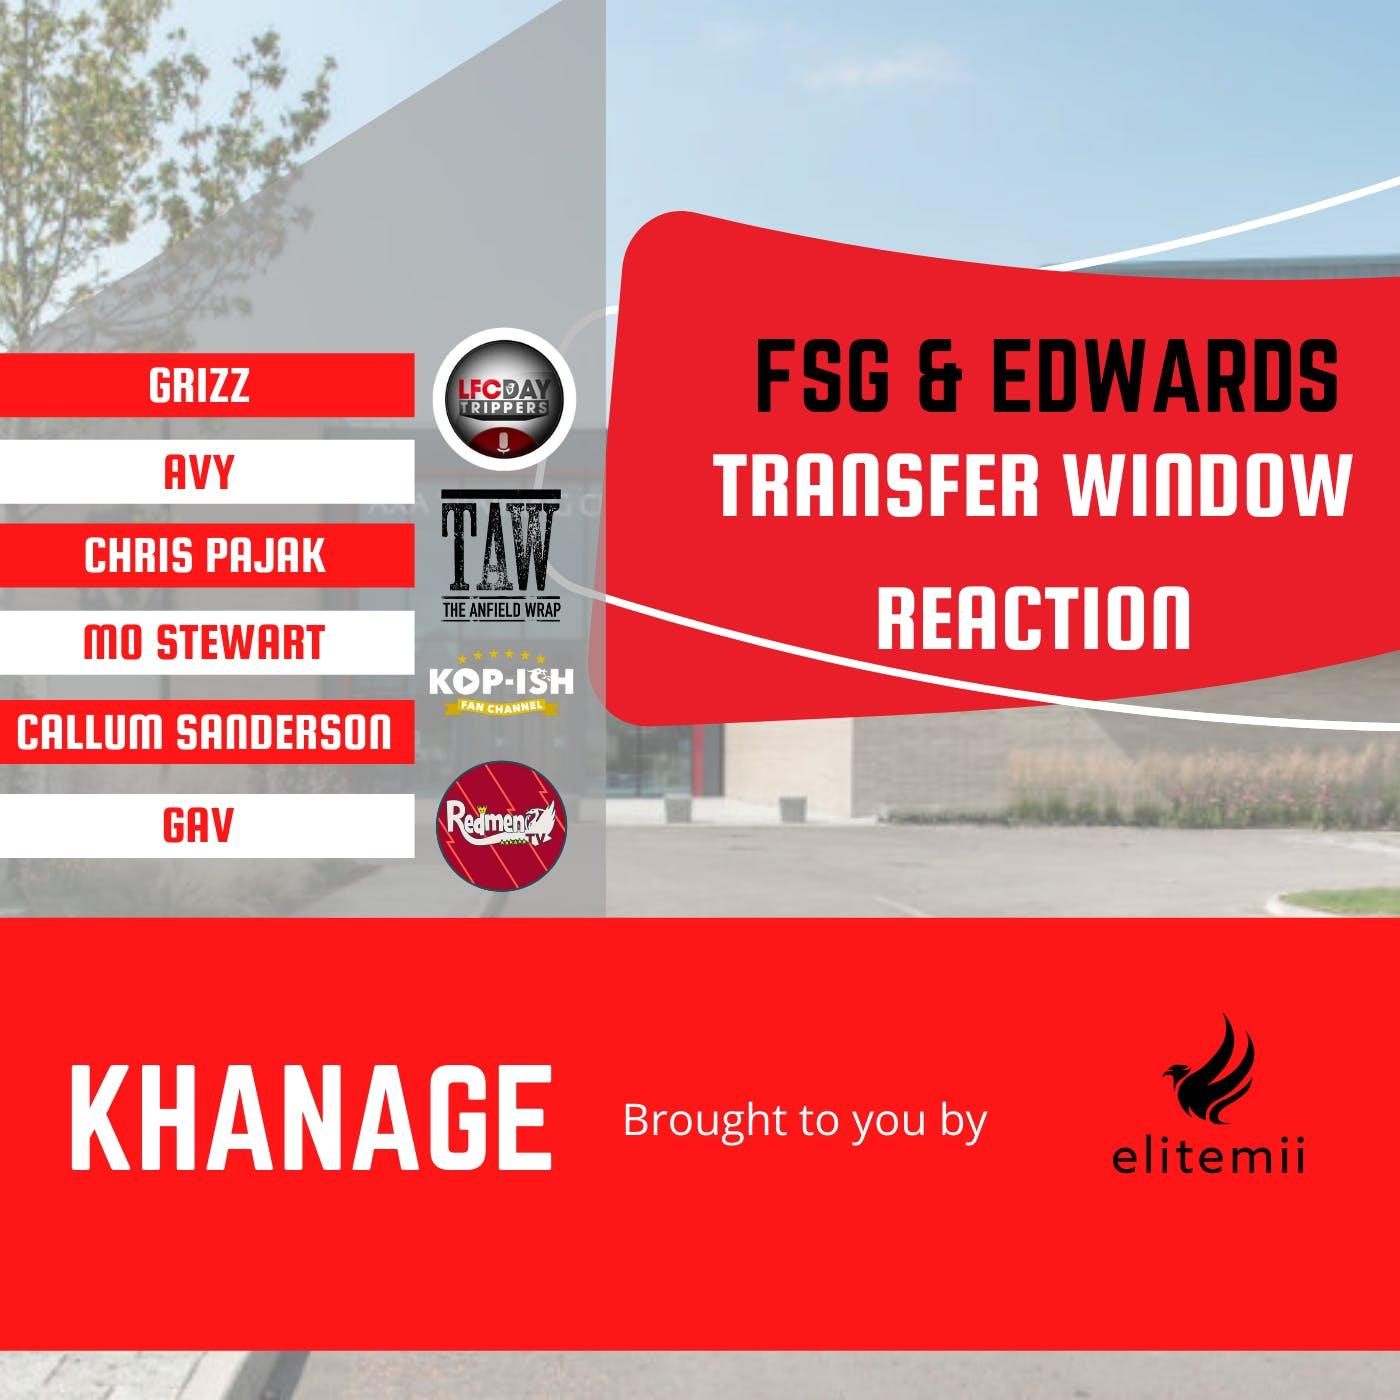 Liverpool Fan Reaction | Edwards & FSG | Khanage